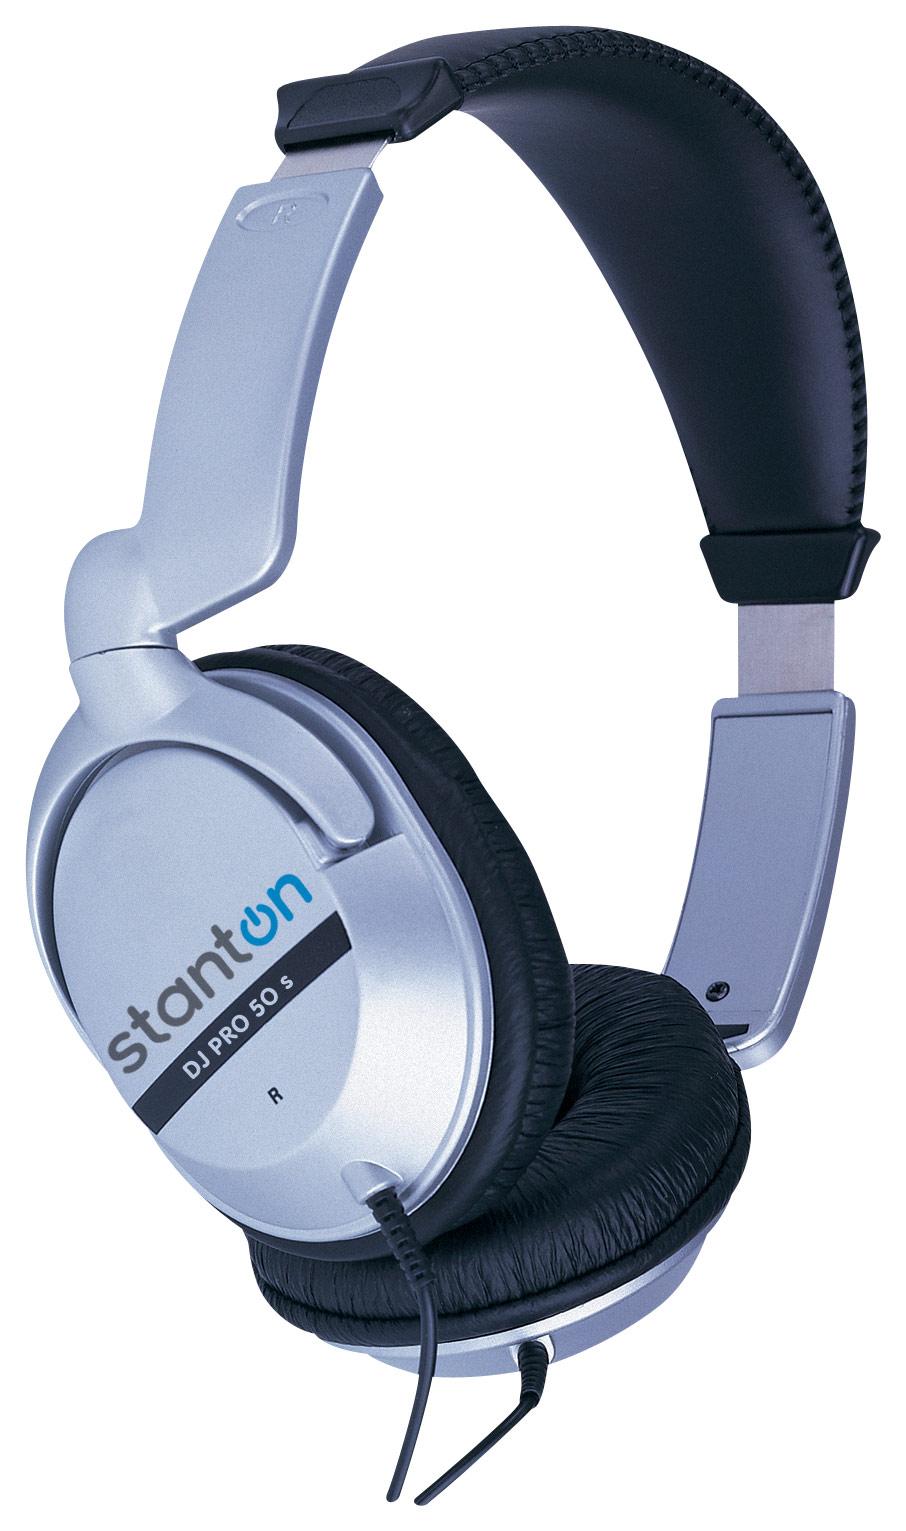 Stanton - DJ PRO 50S Over-the-Ear Headphones - Silver/Black